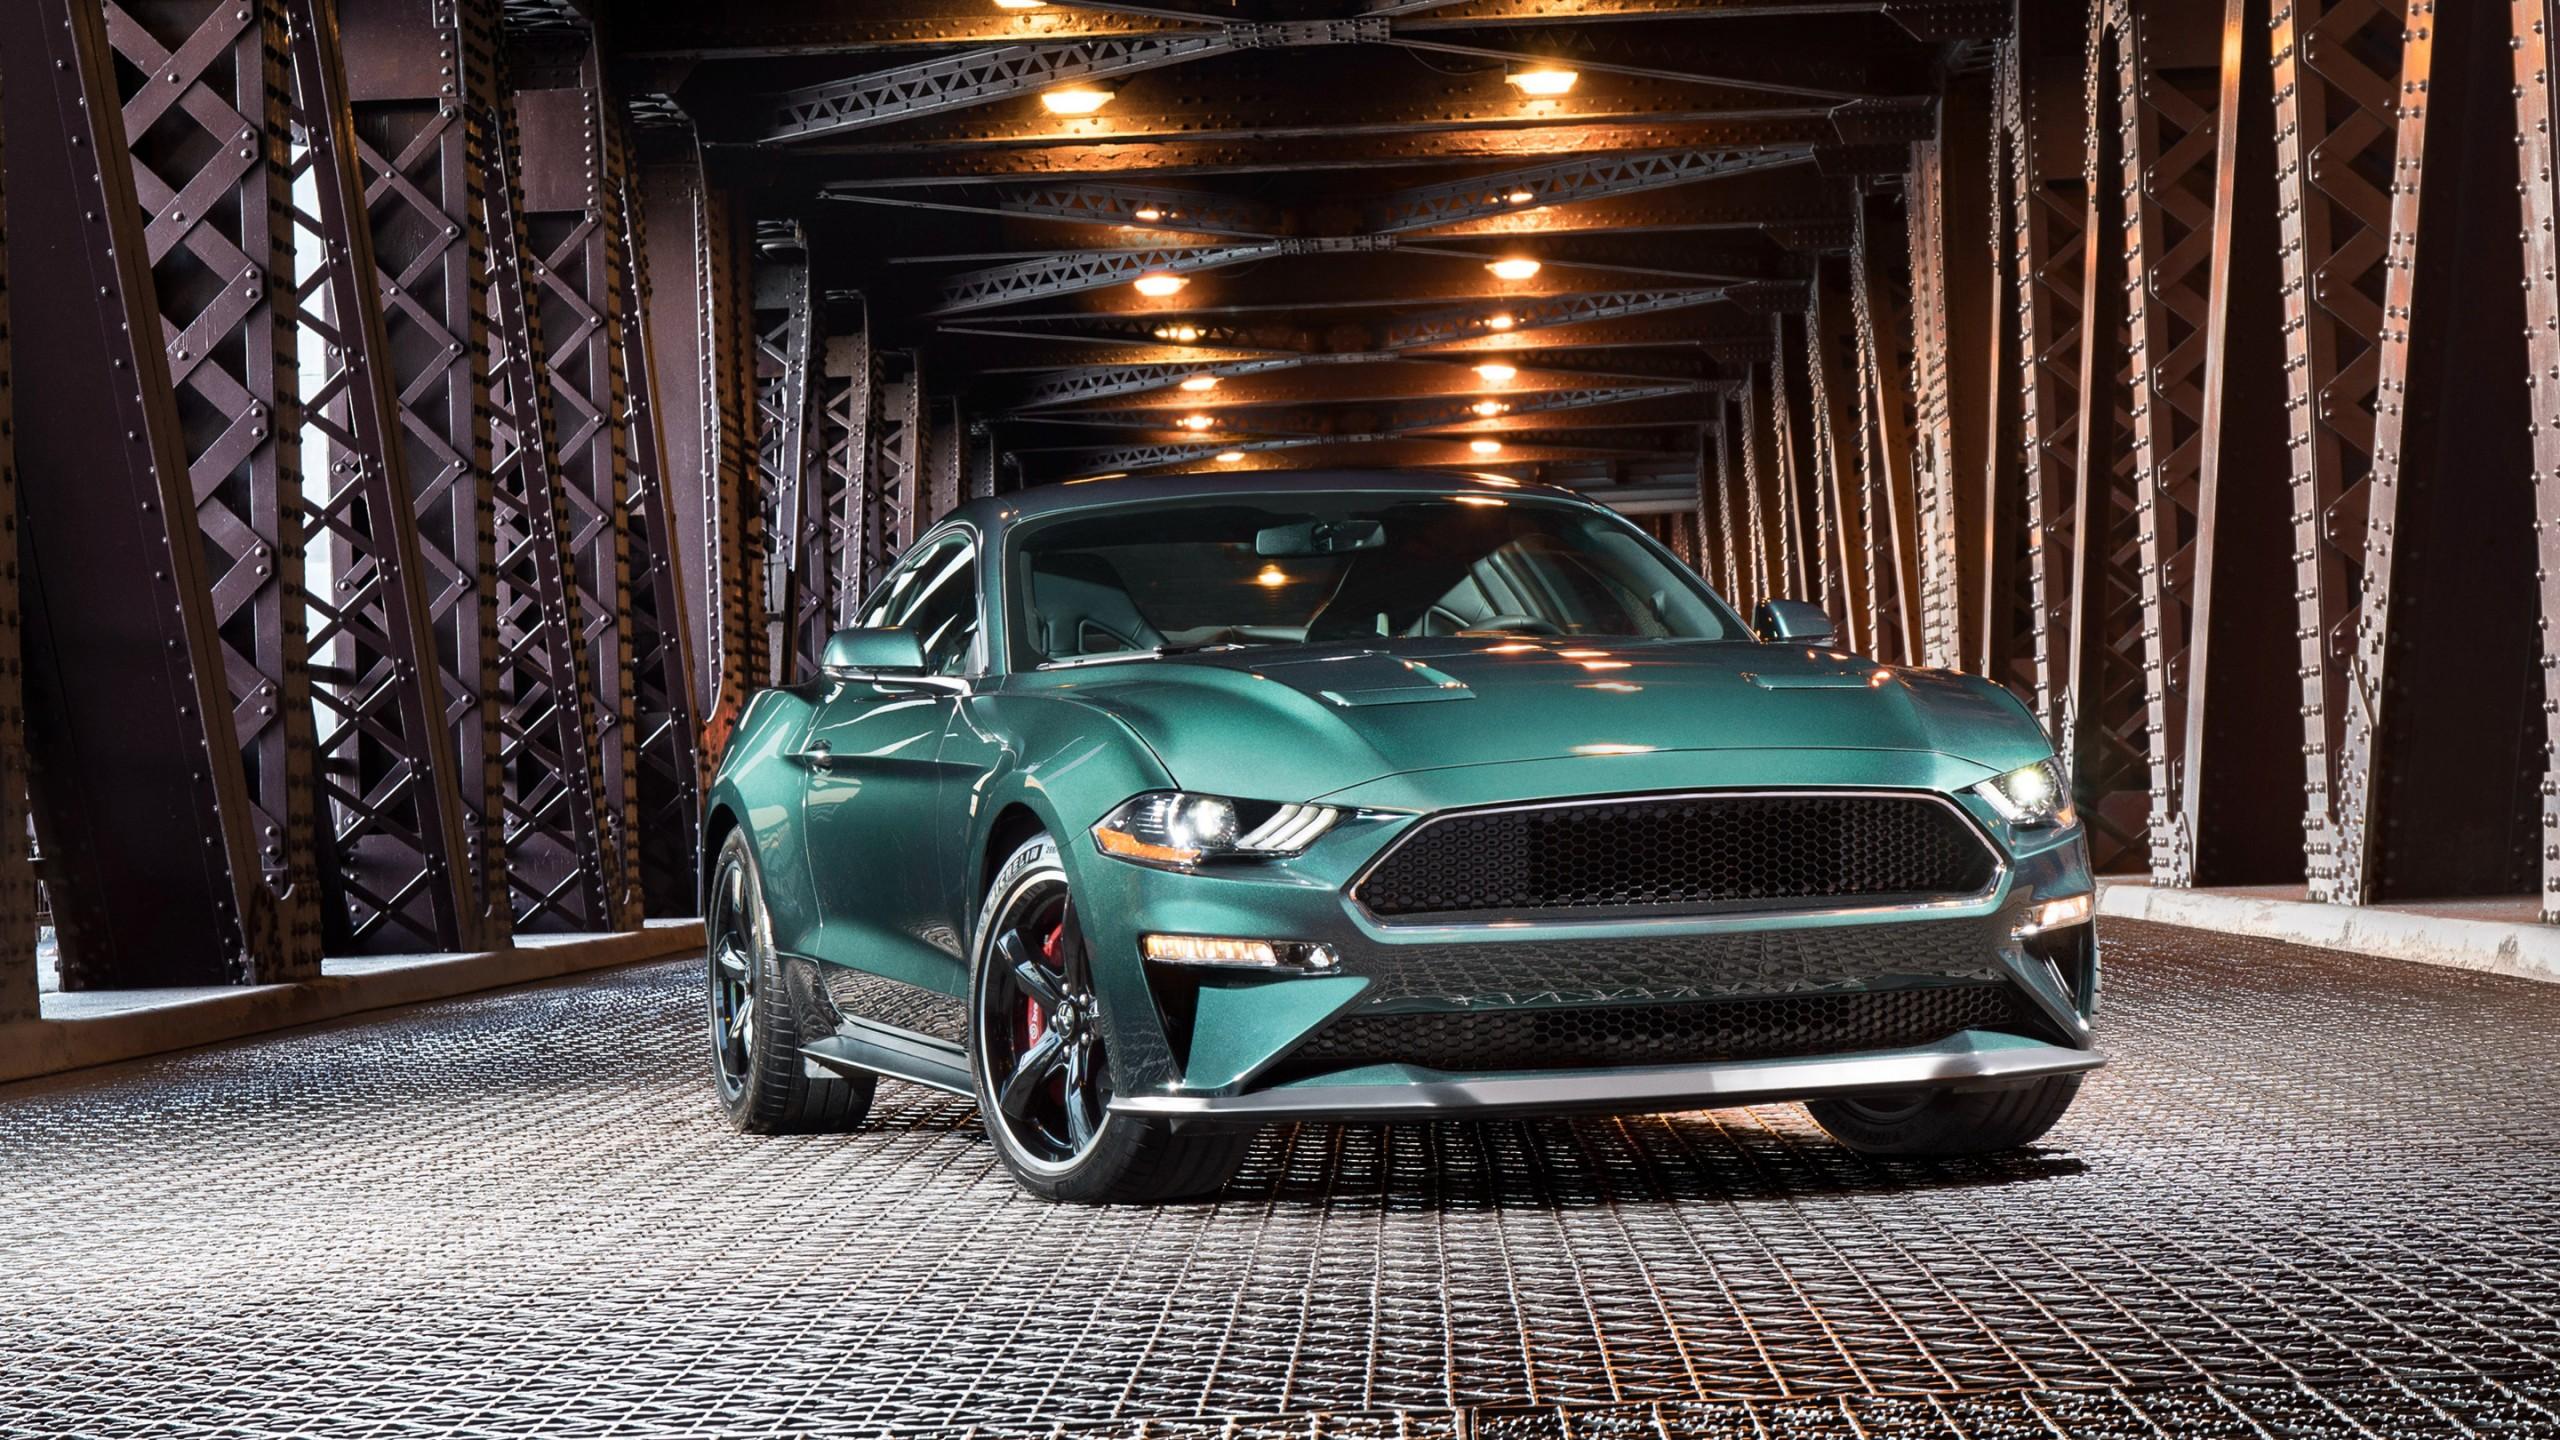 Mini Hd Wallpaper 2019 Ford Mustang Bullitt Wallpaper Hd Car Wallpapers